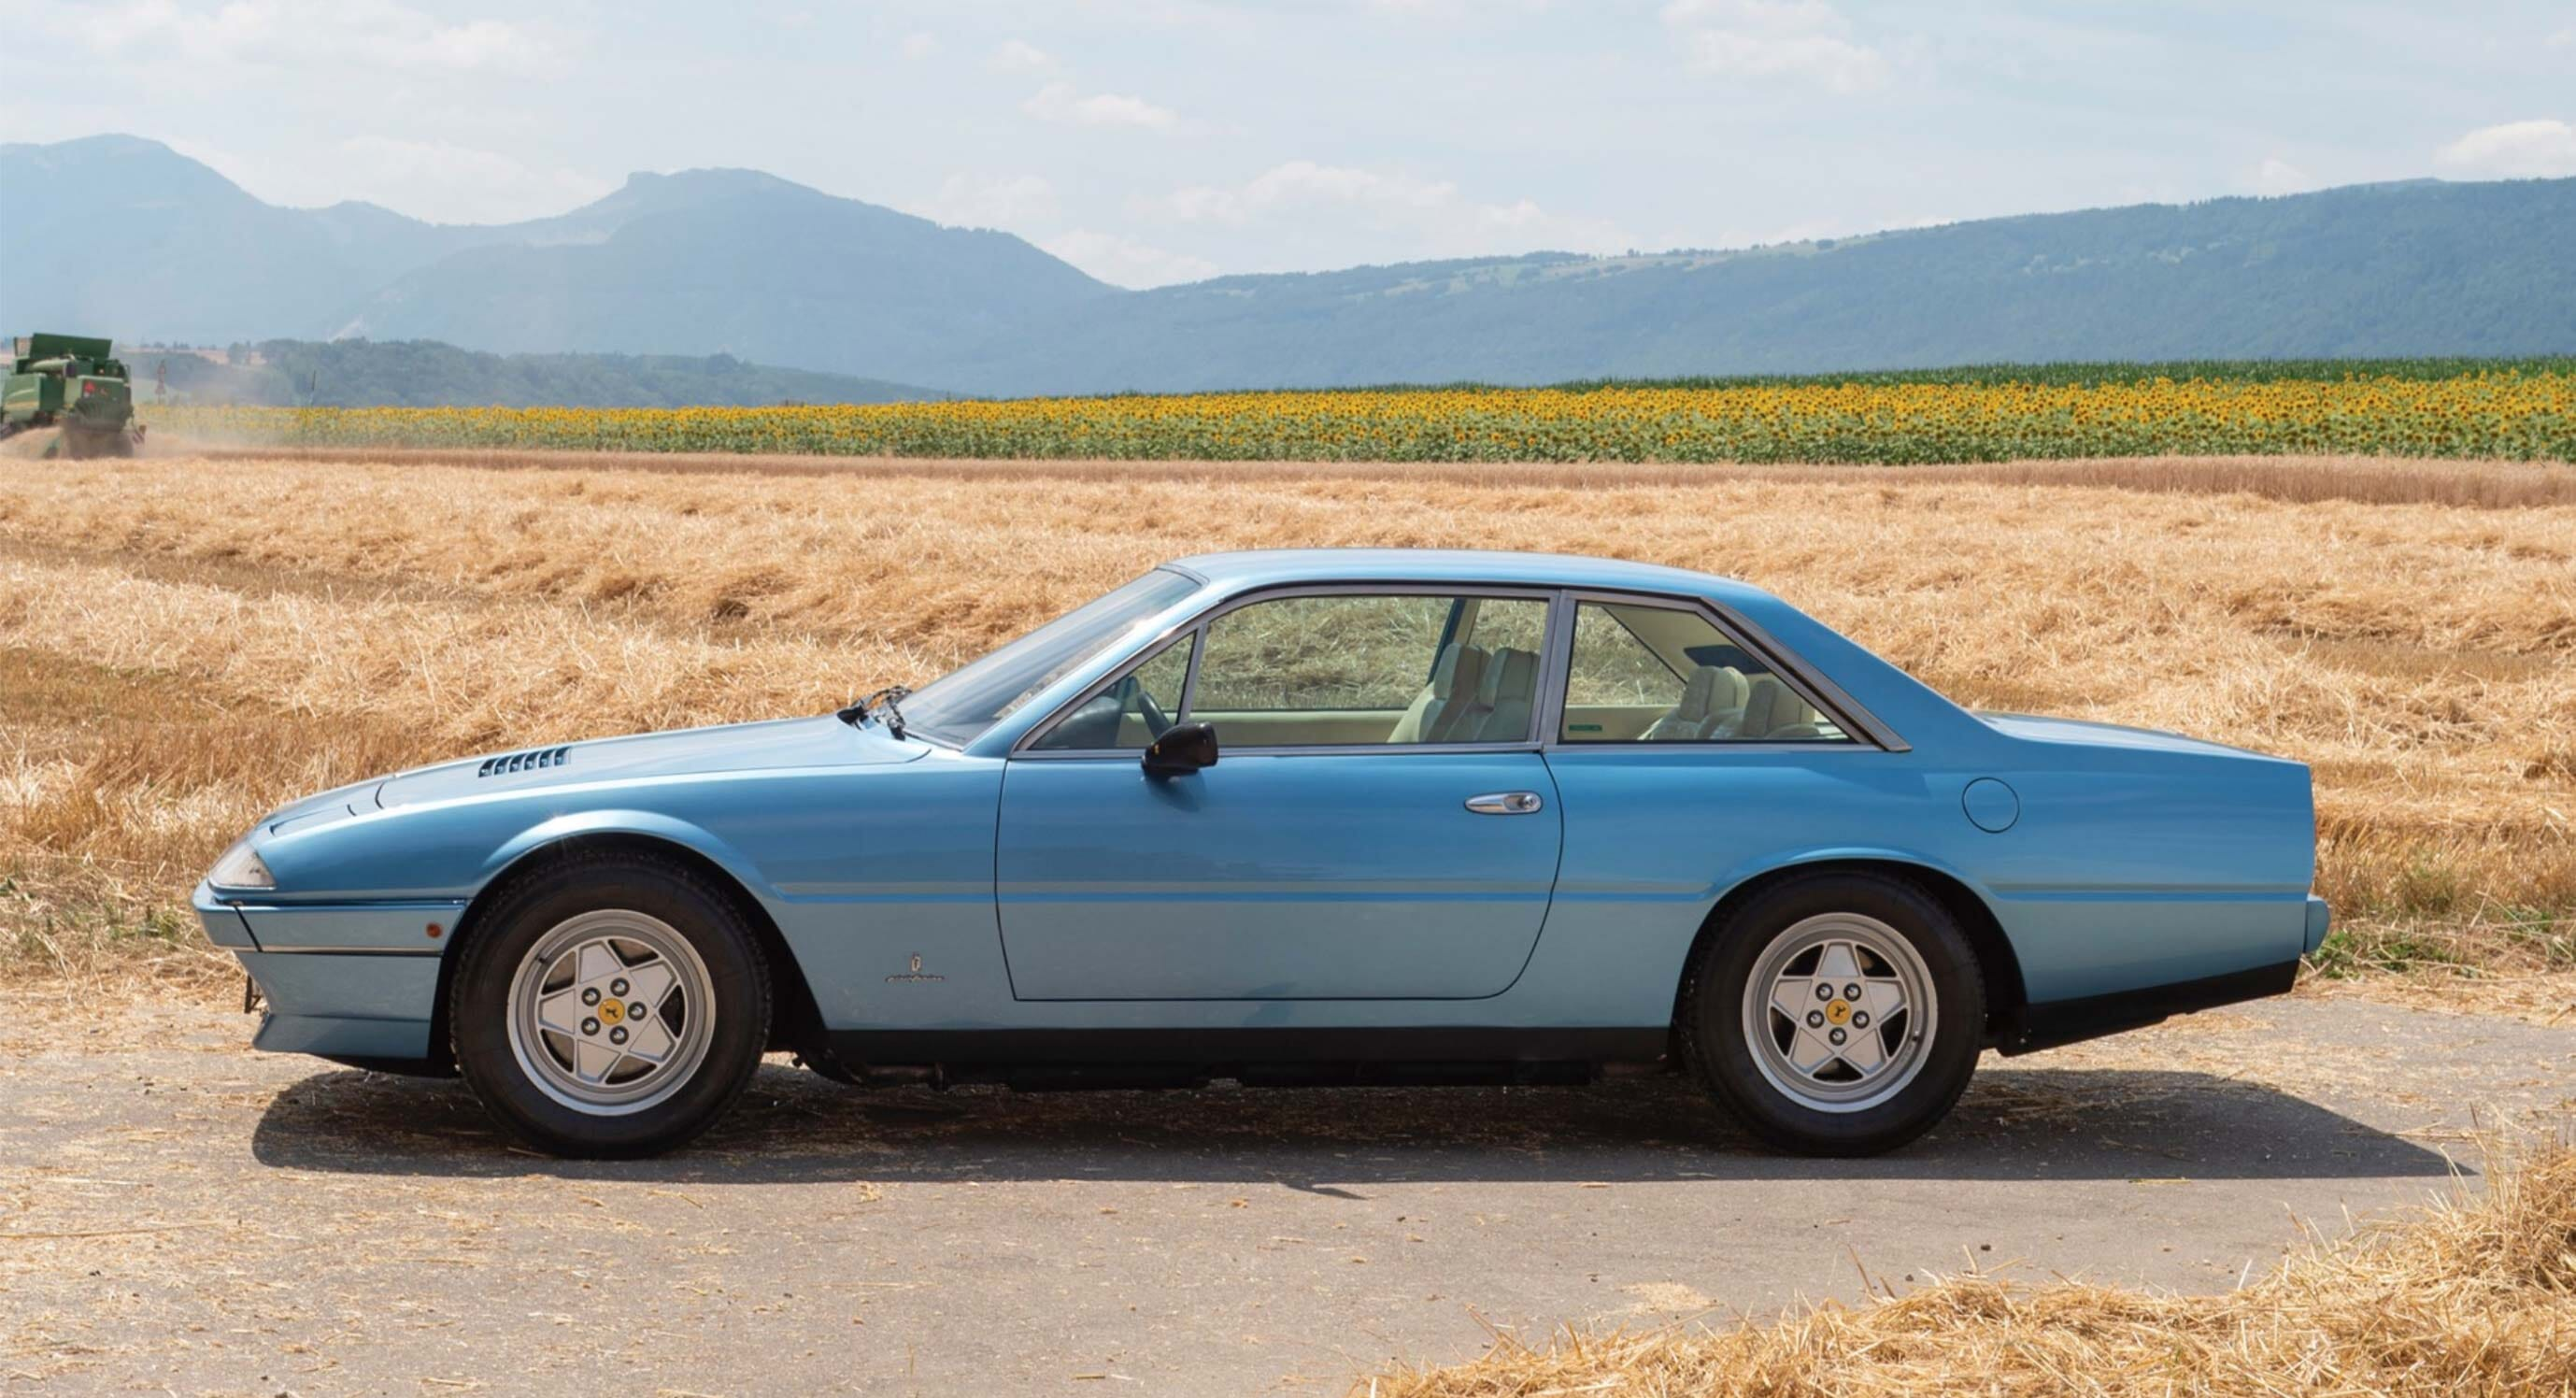 1986 Ferrari 412: Cross-continental travel made easy